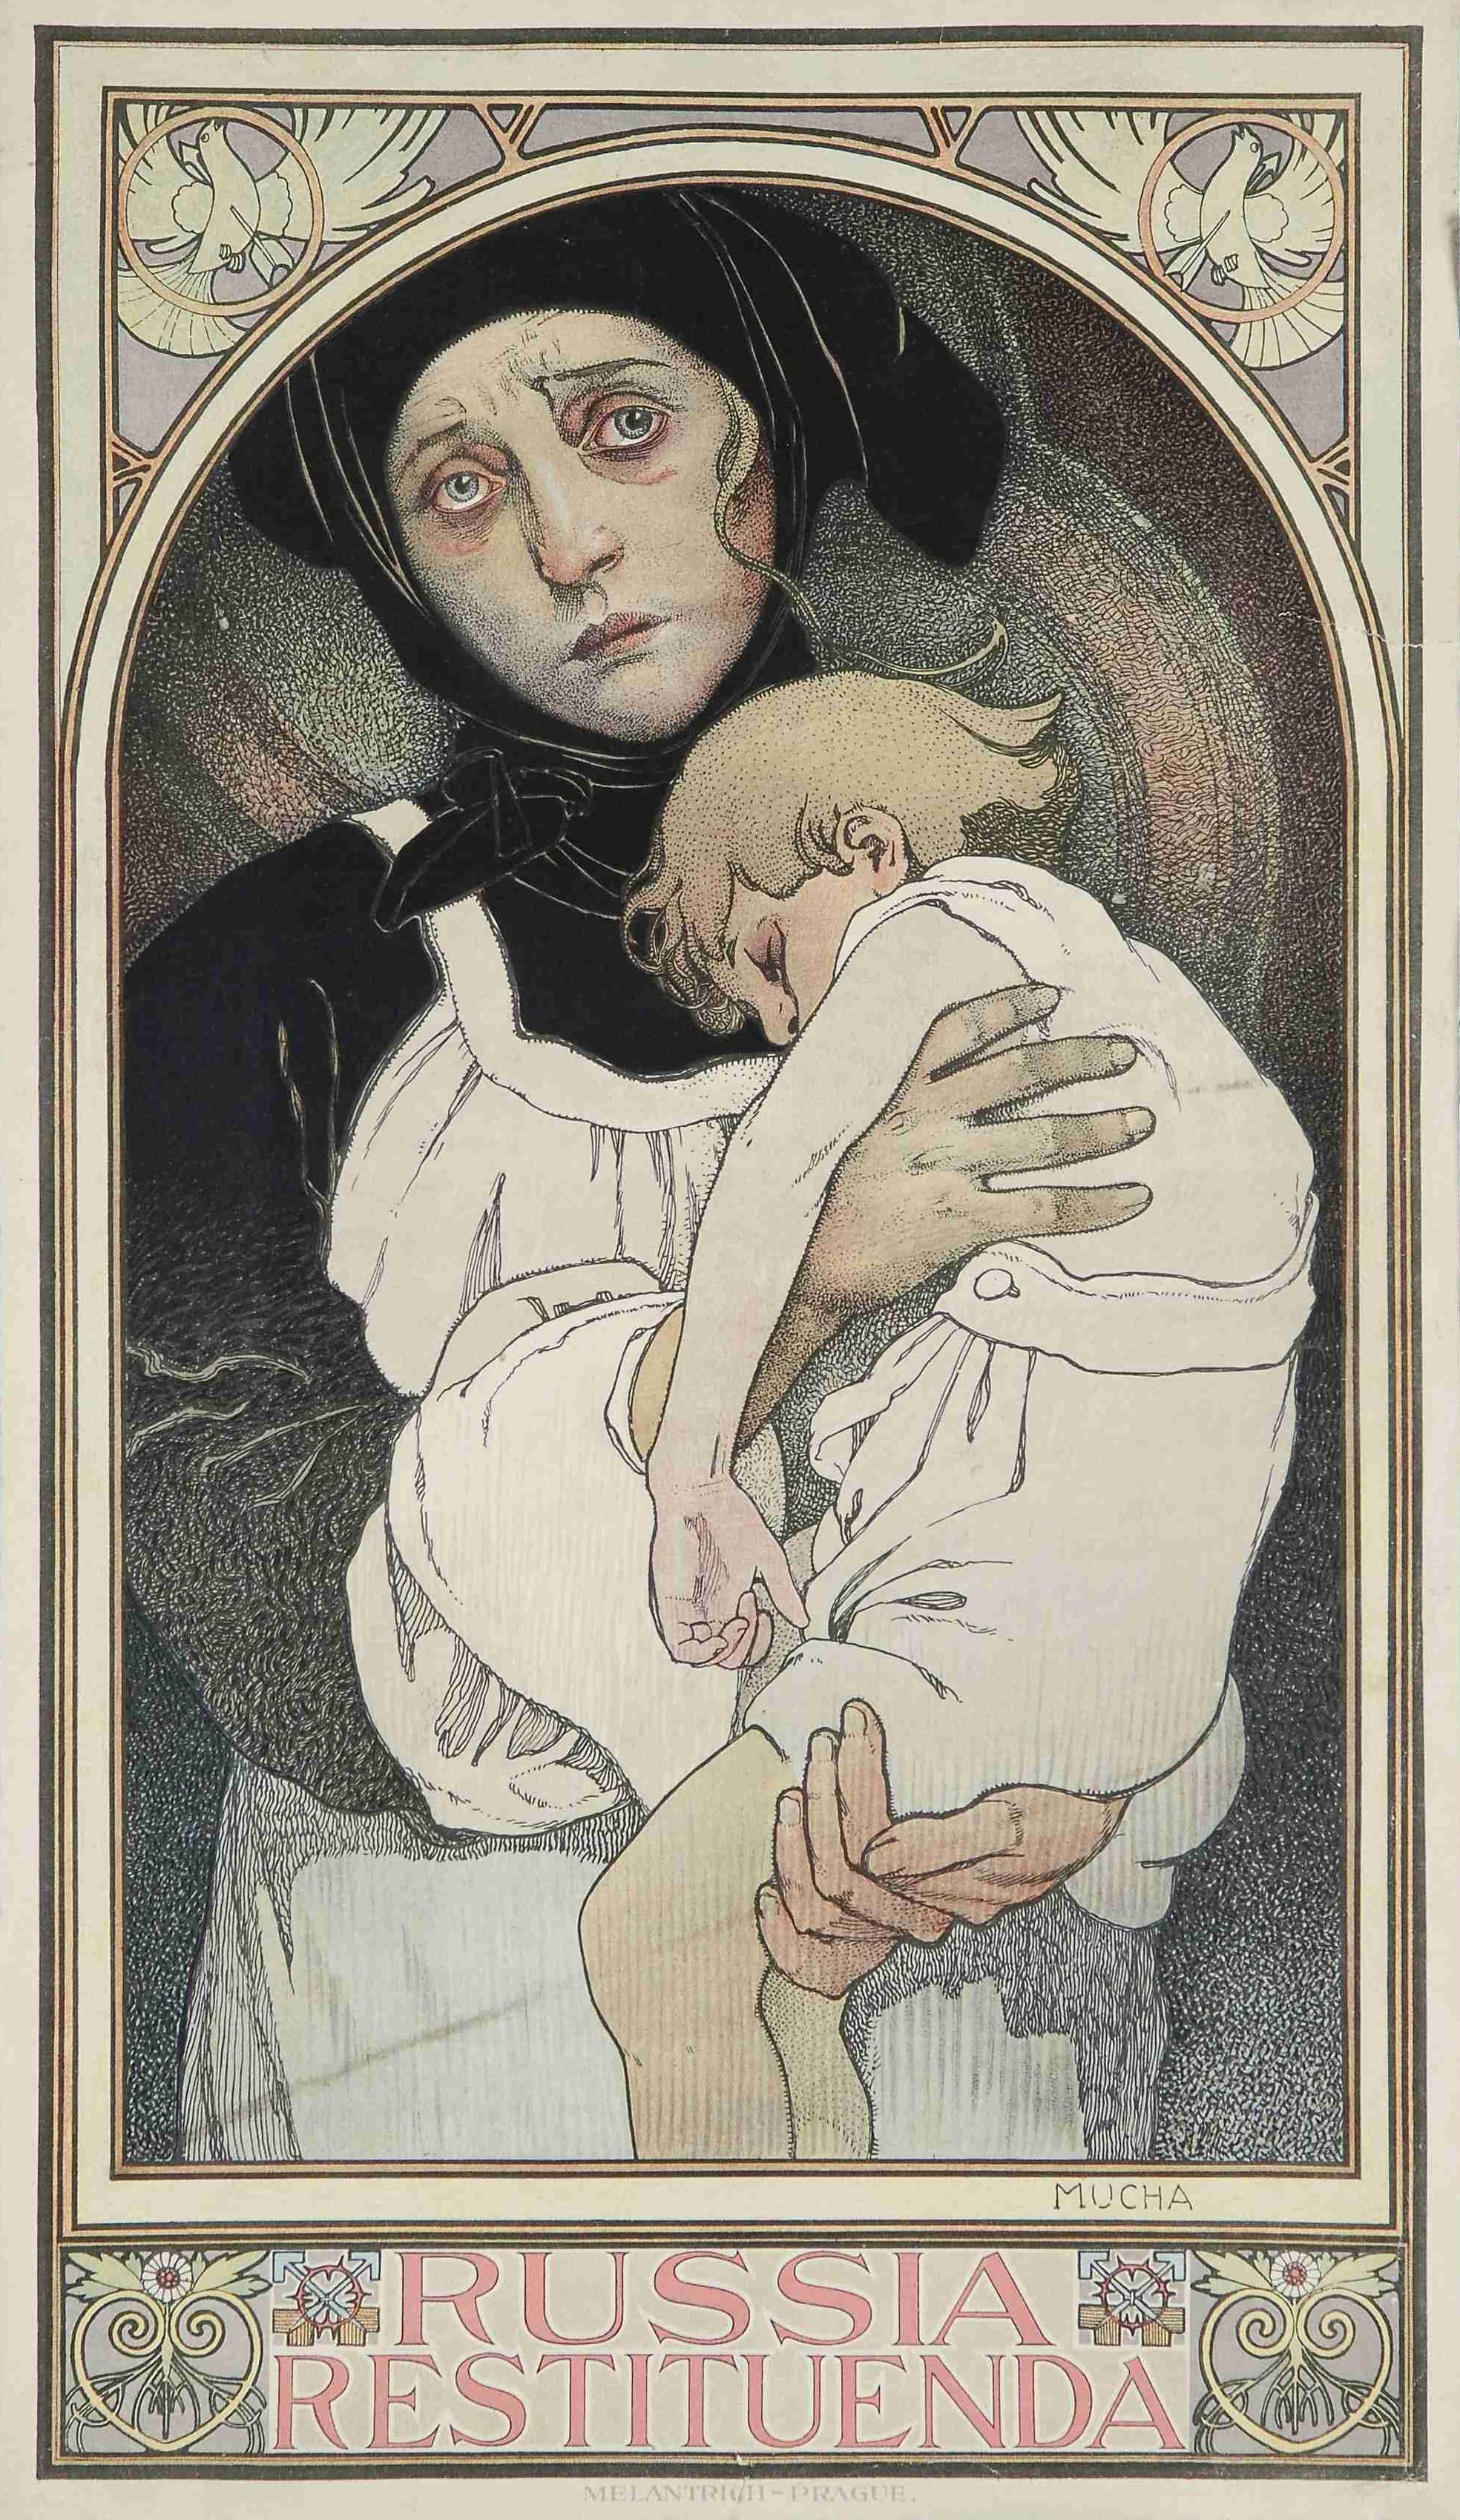 Плакат Russia Restituenda-1922